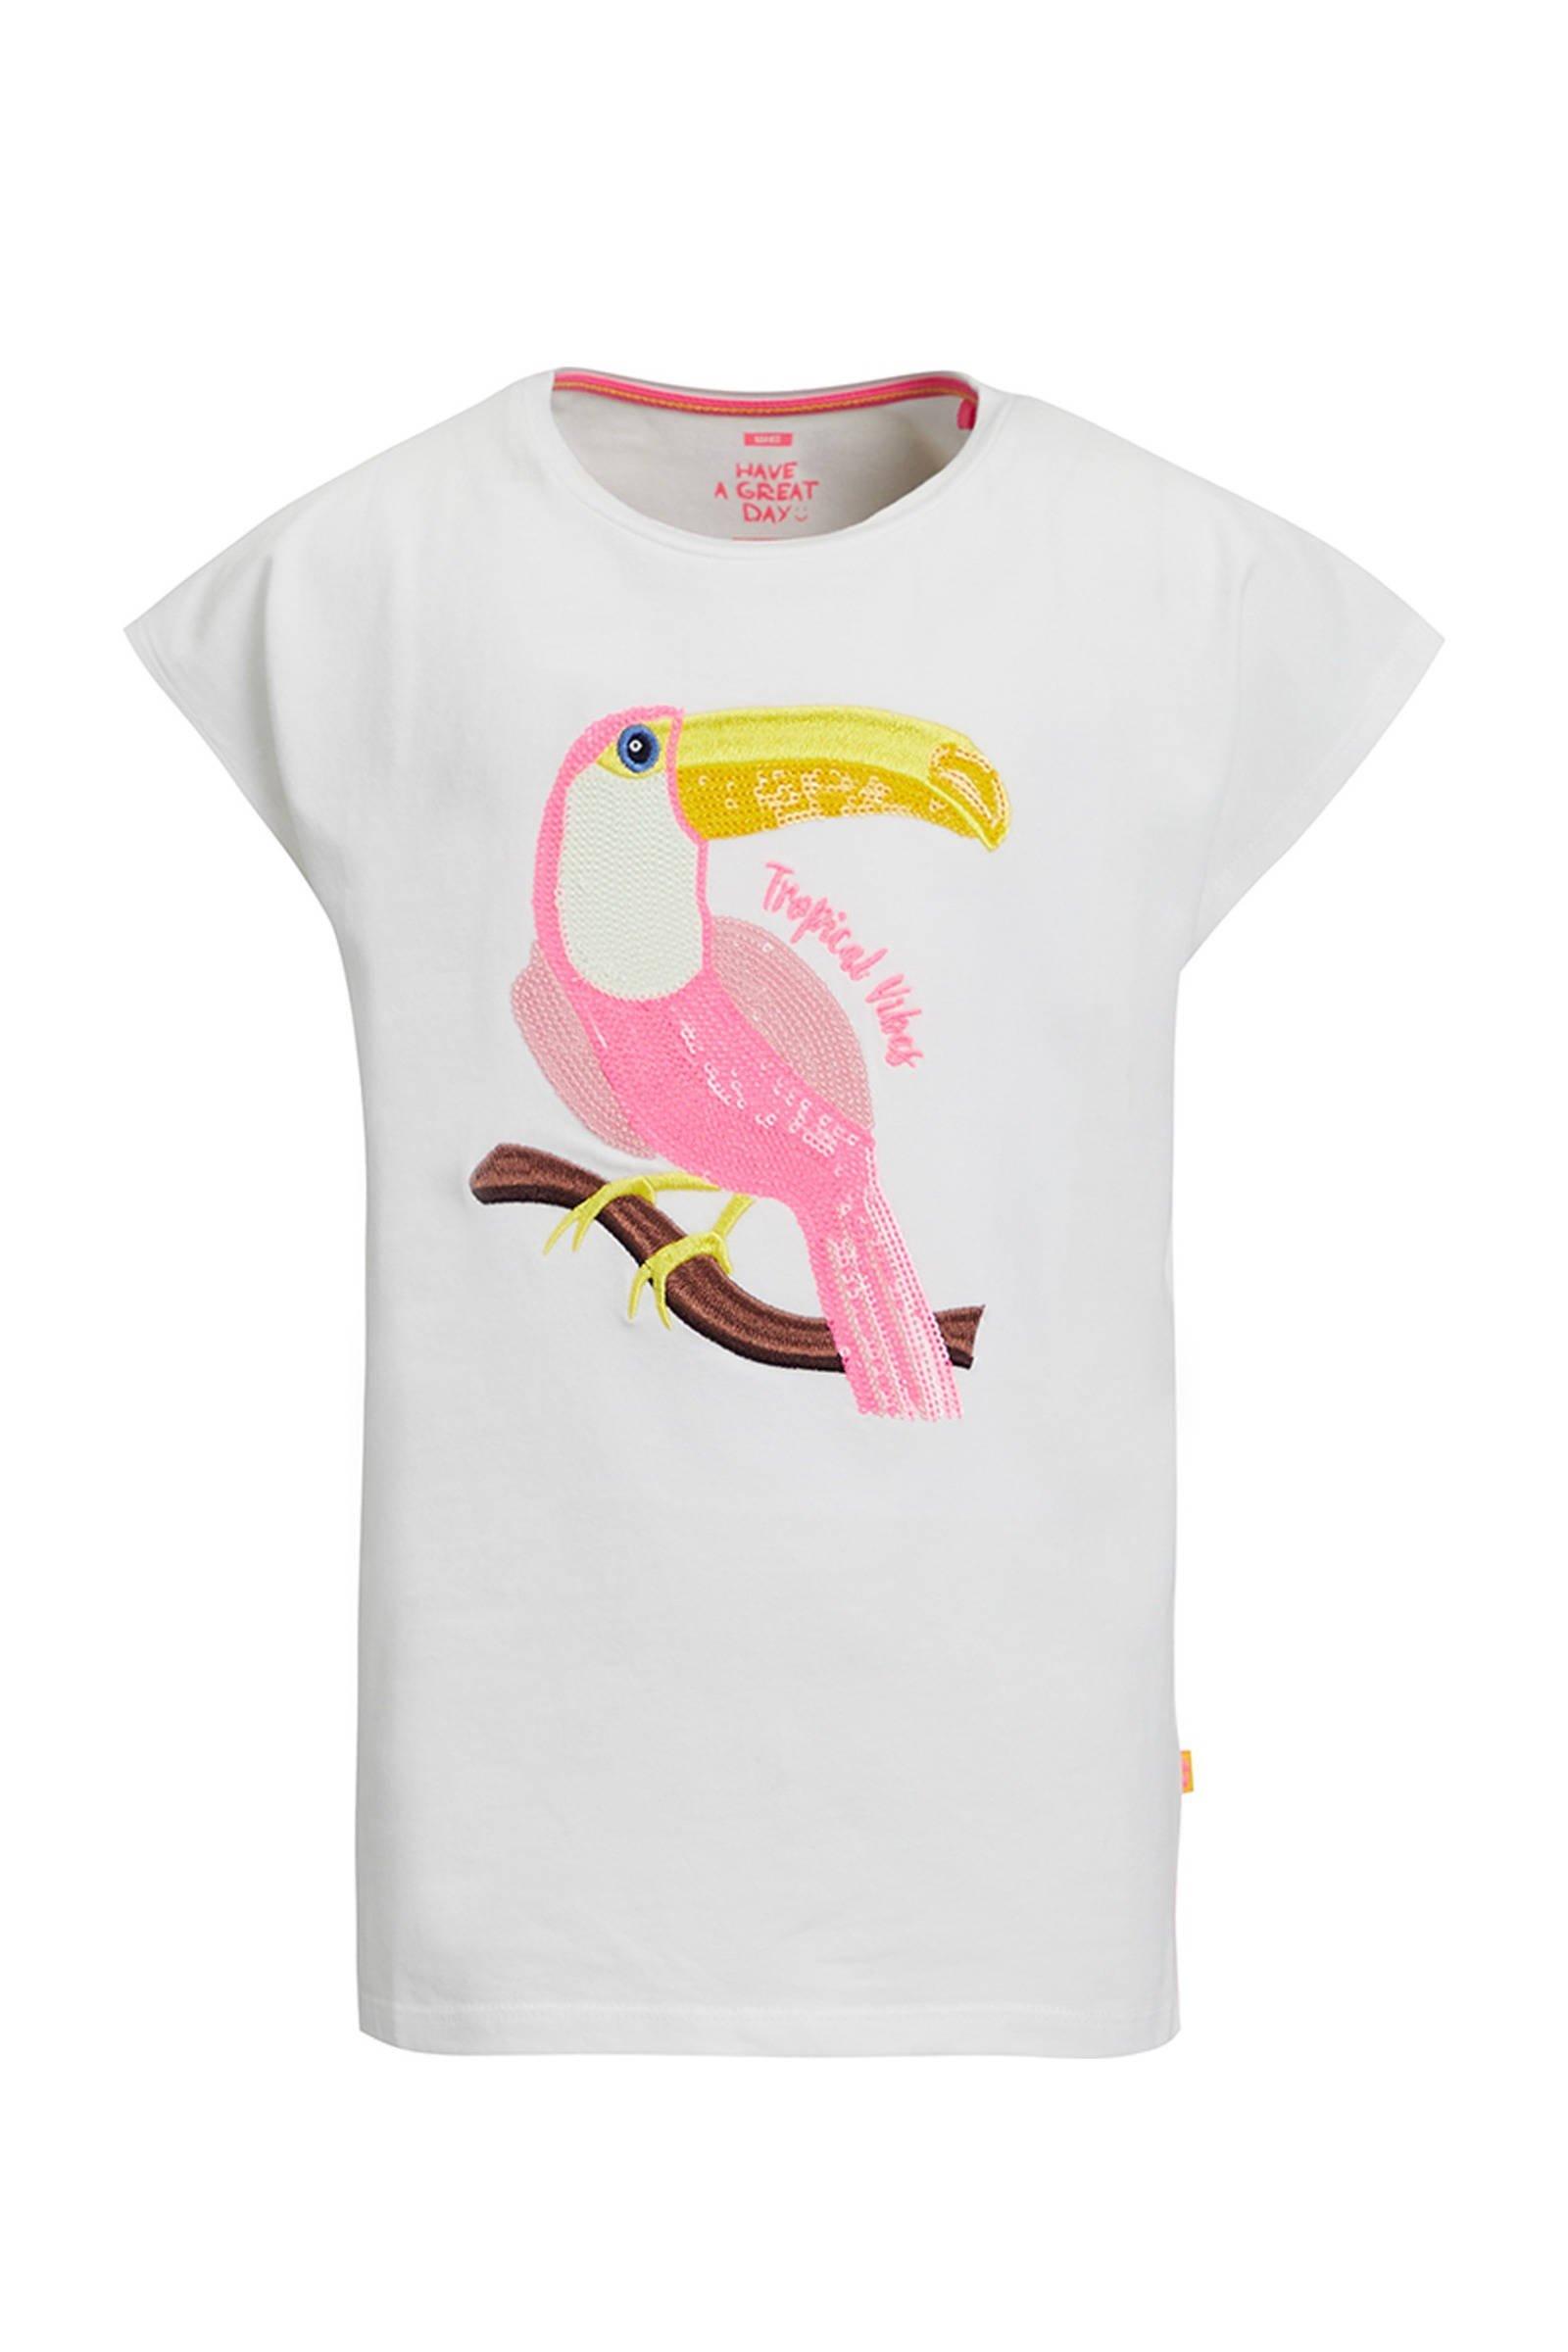 WE Fashion T-shirt met printopdruk en pailletten wit - maat 110/116